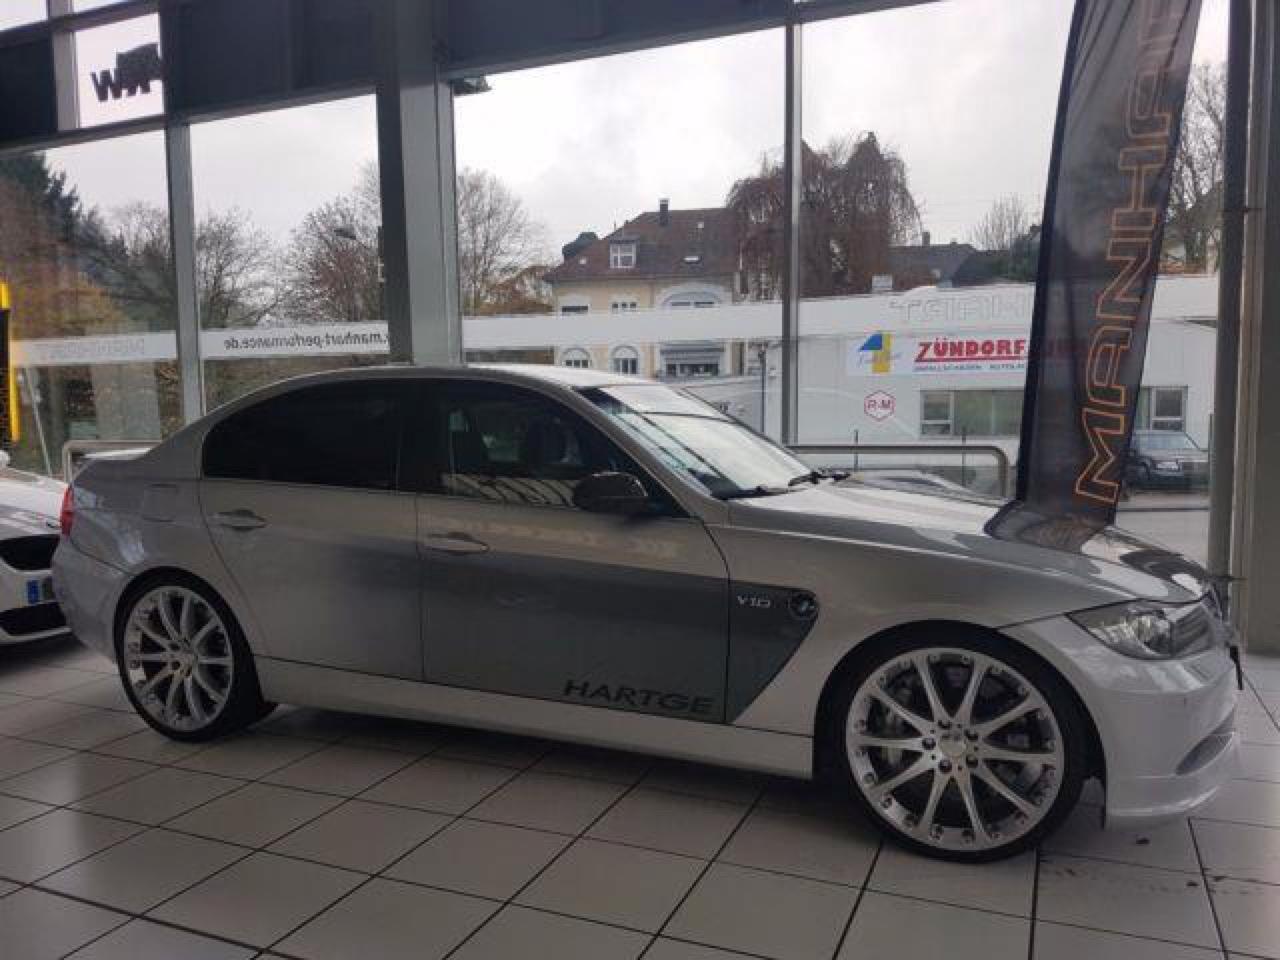 BMW-Hartge-V10-3-serie-01.jpg